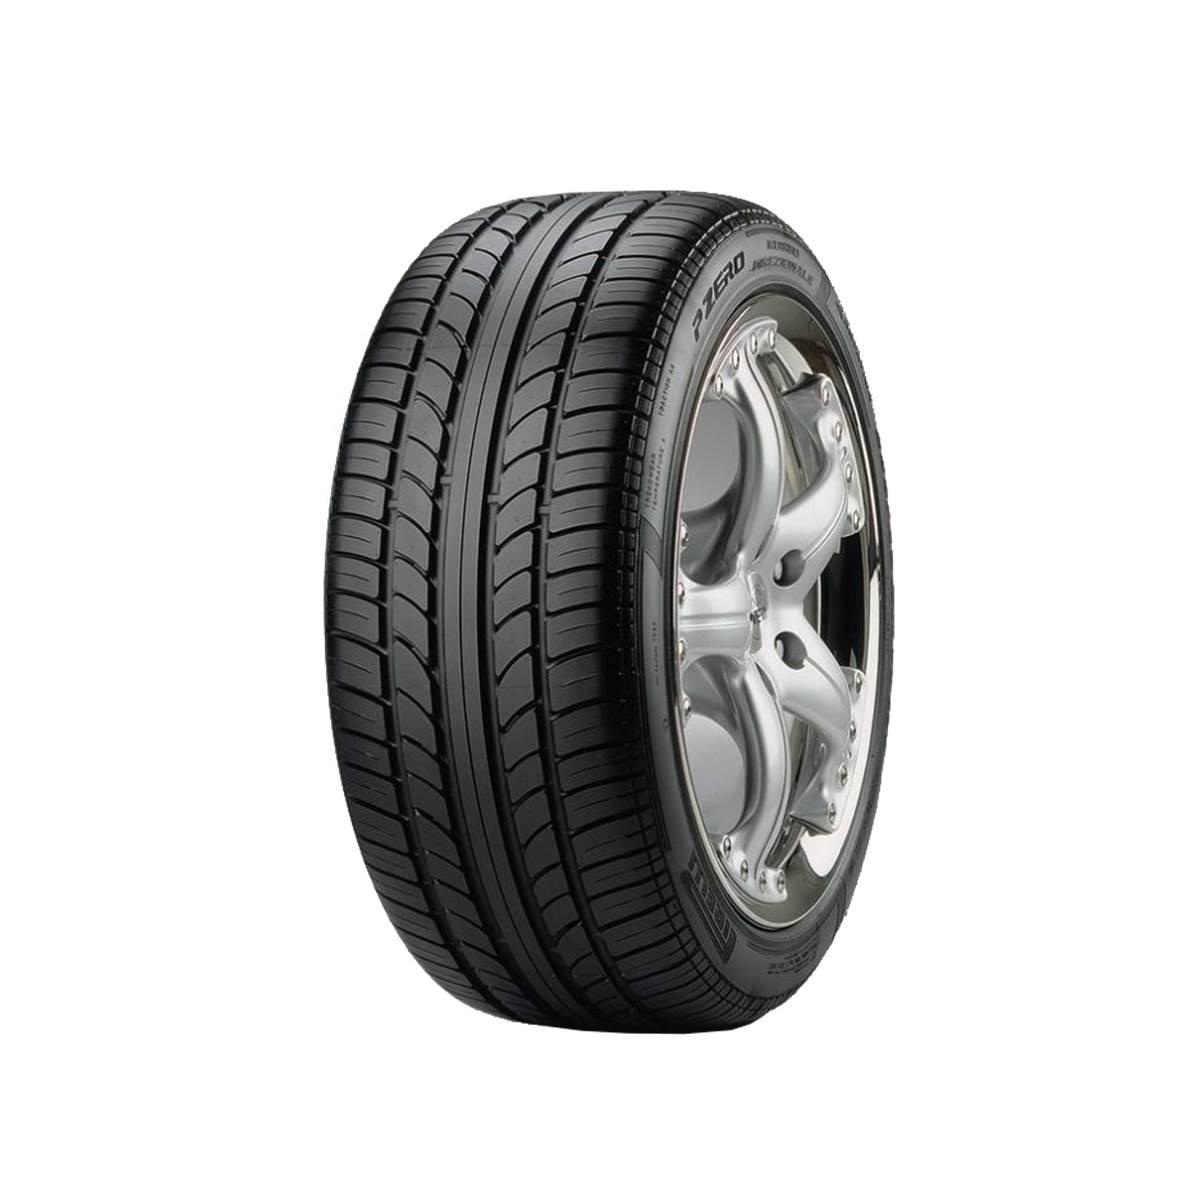 Pneu Pirelli 245/45R18 100Y Pzero Rosso Direzionale XL